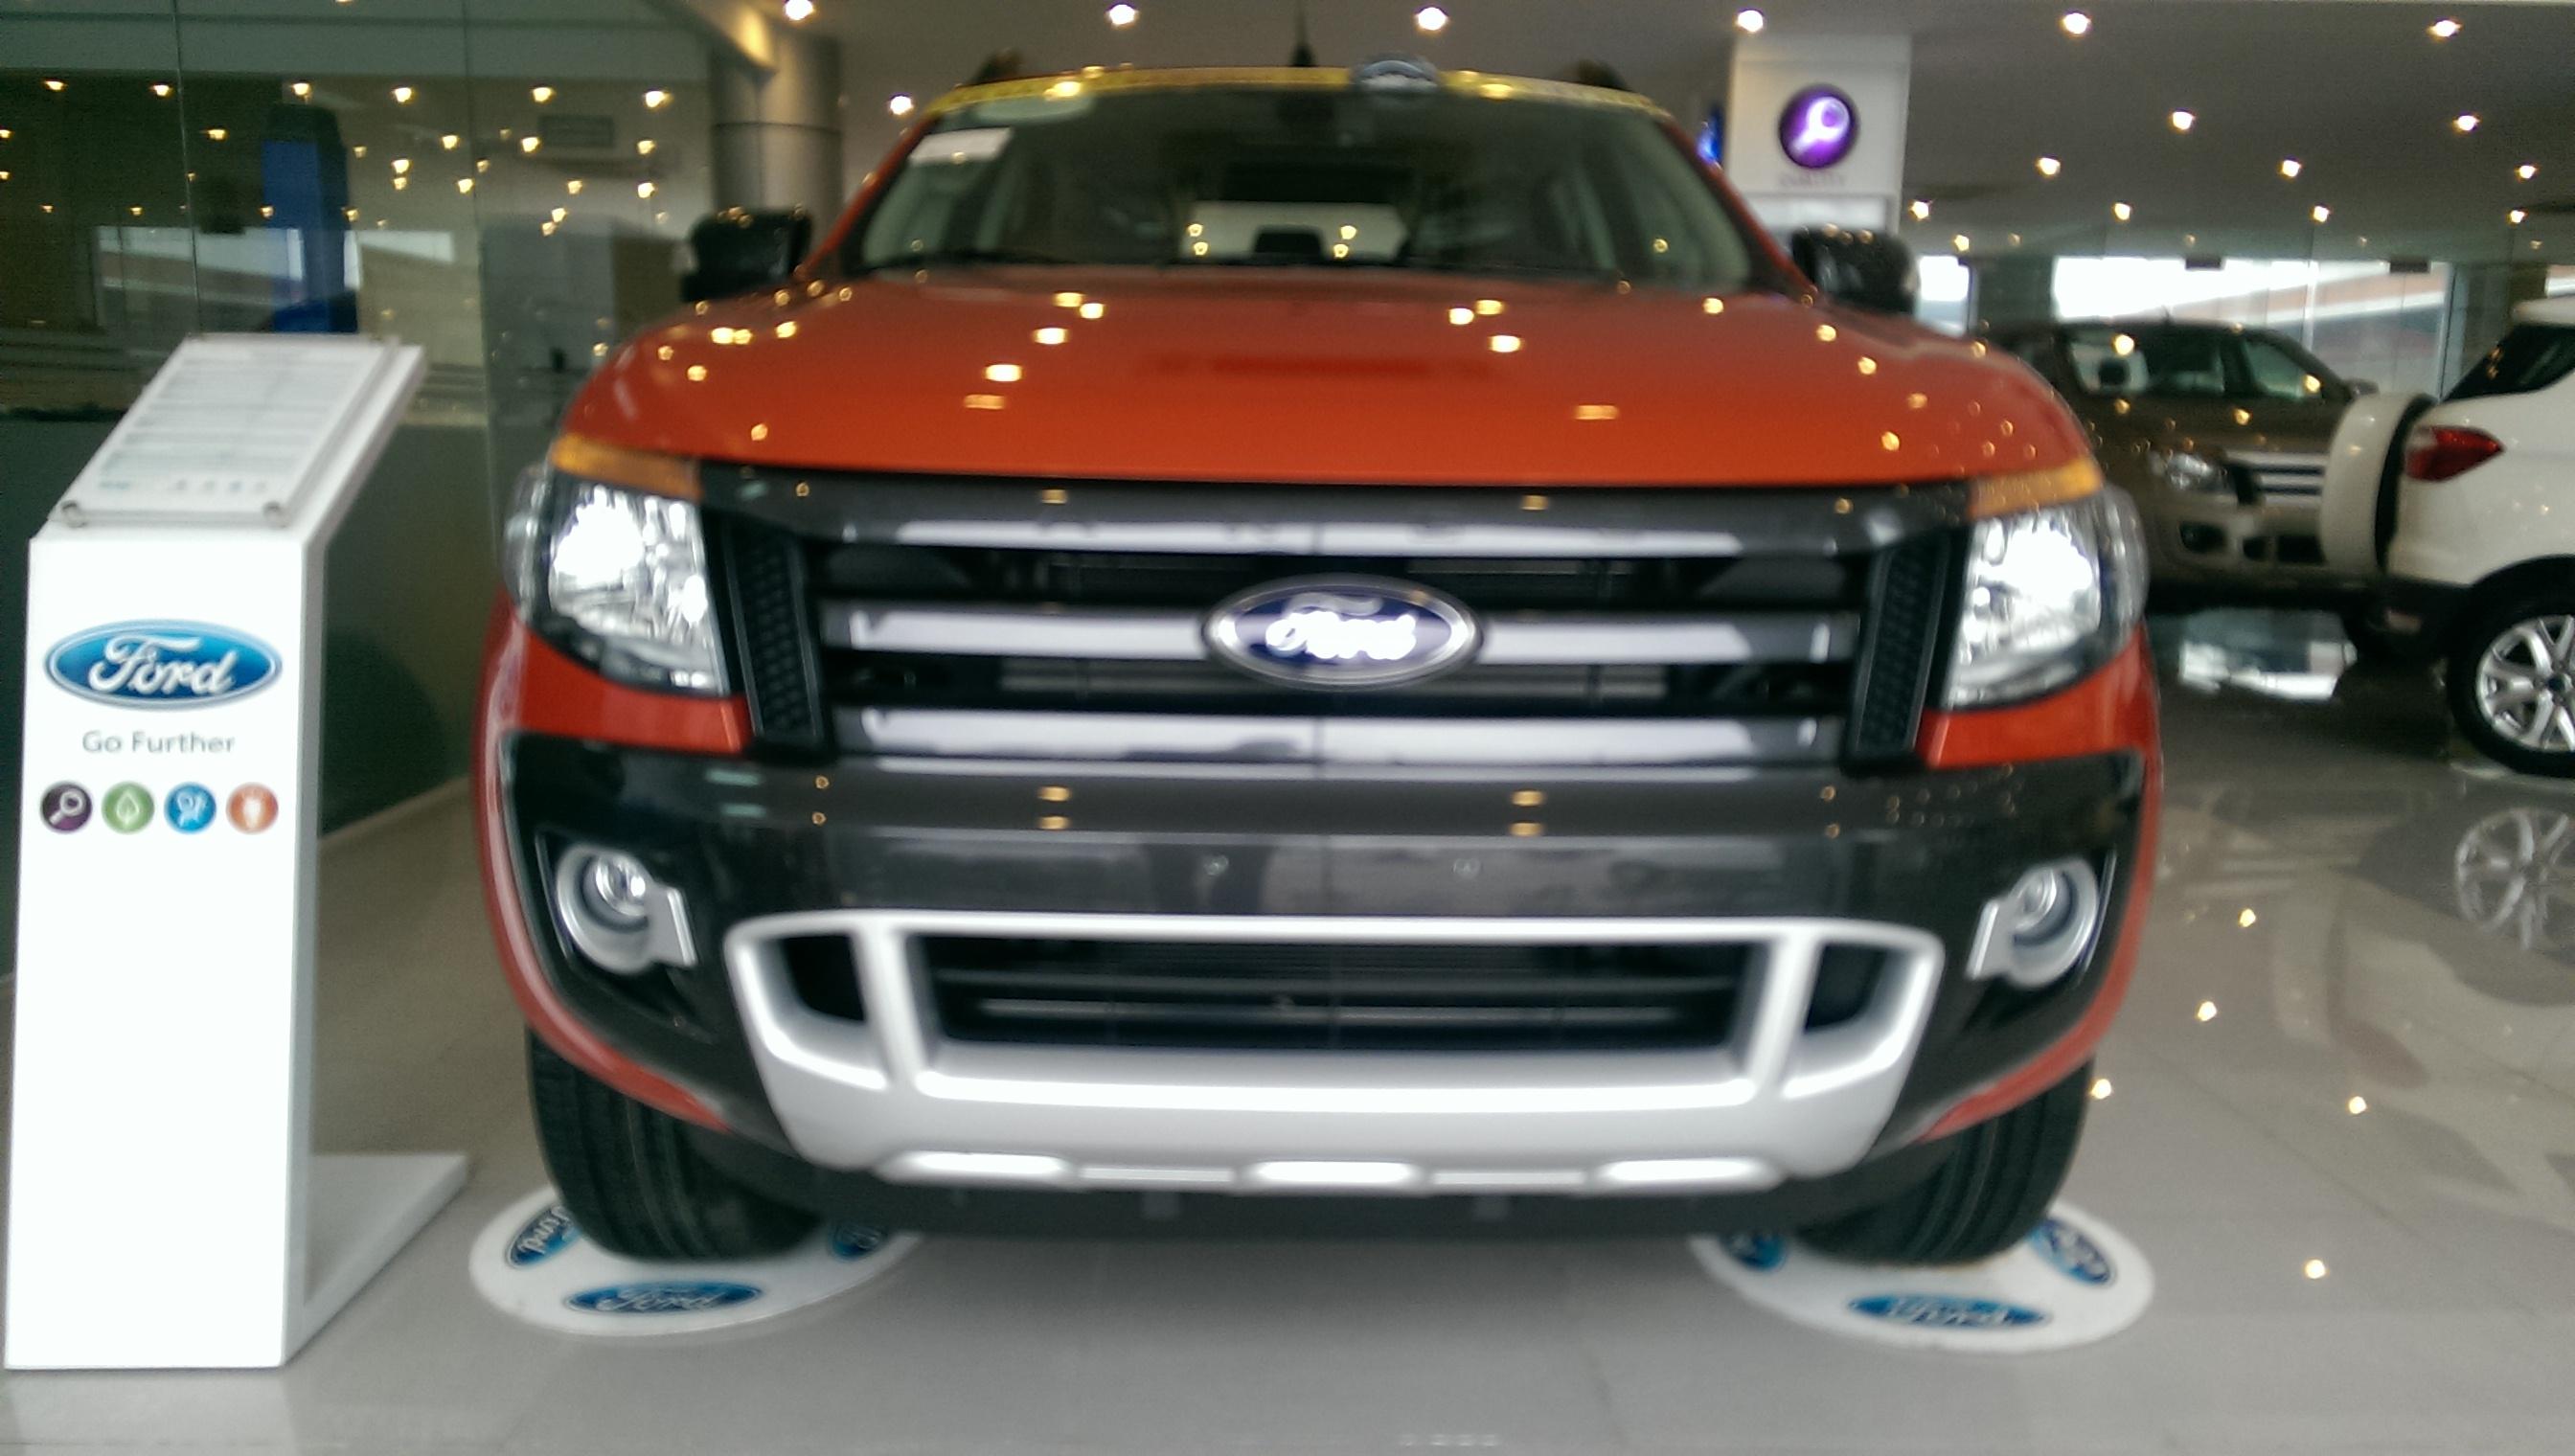 Ford Ranger 3.2L 4×4 AT Wildtruck